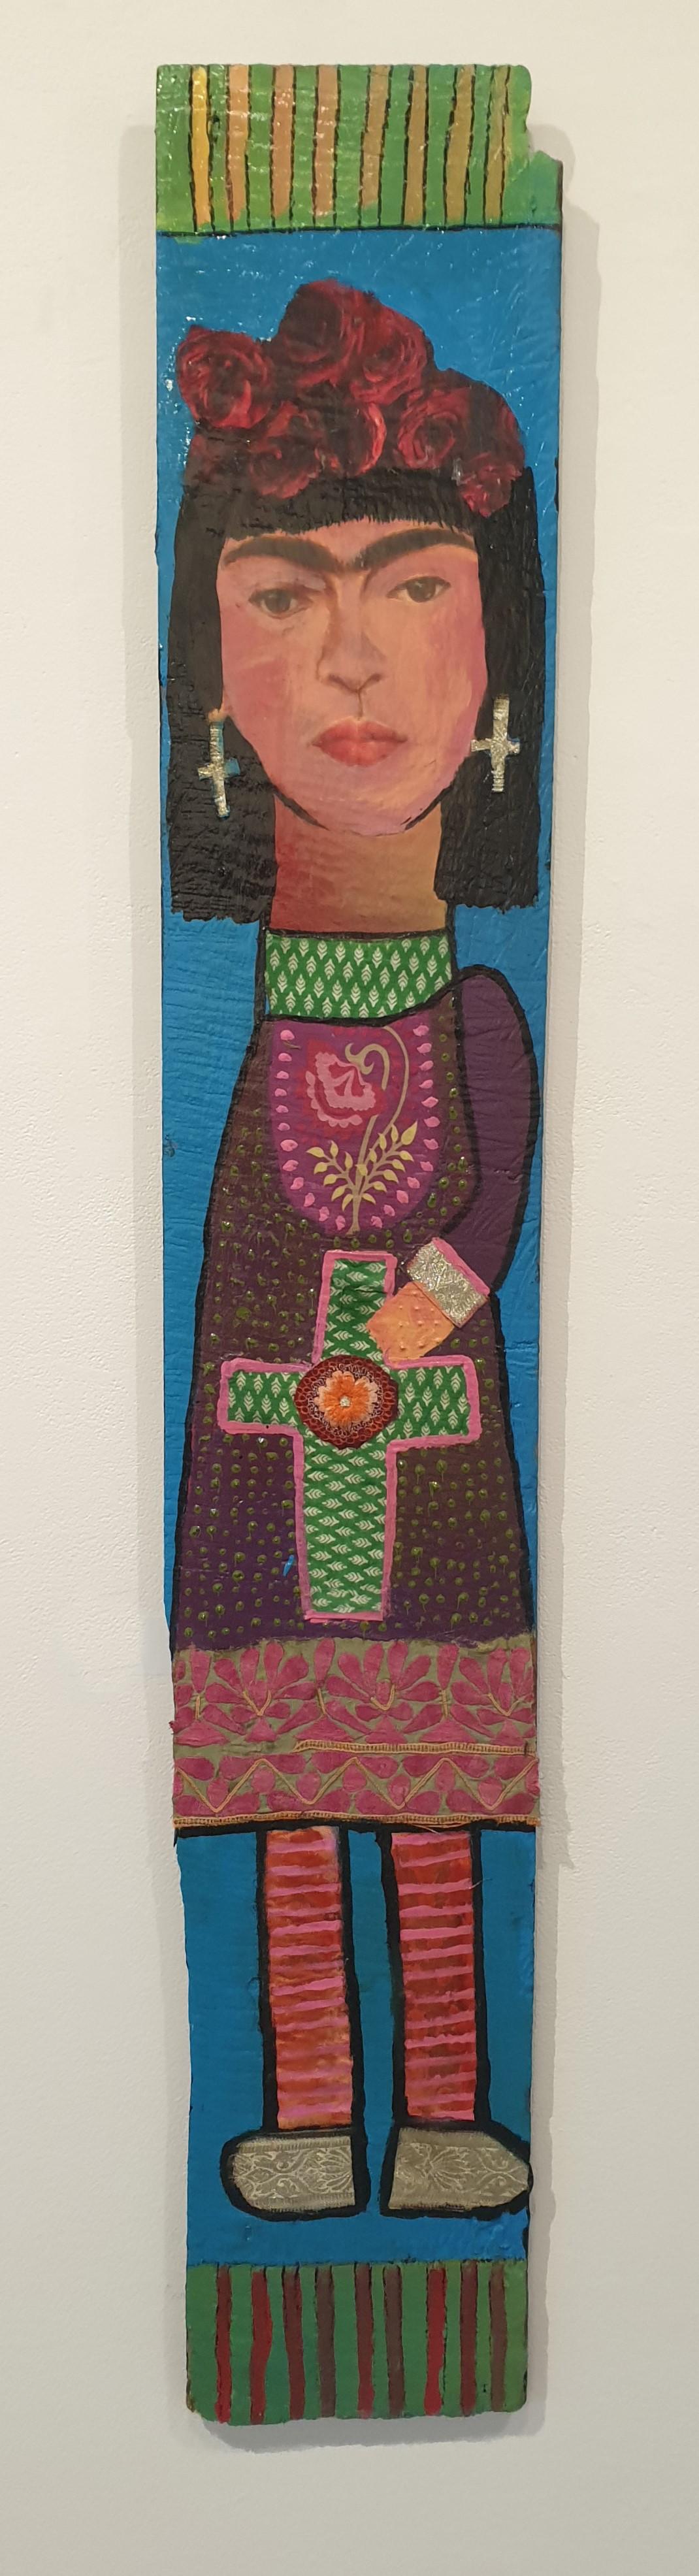 Frida Panel 7